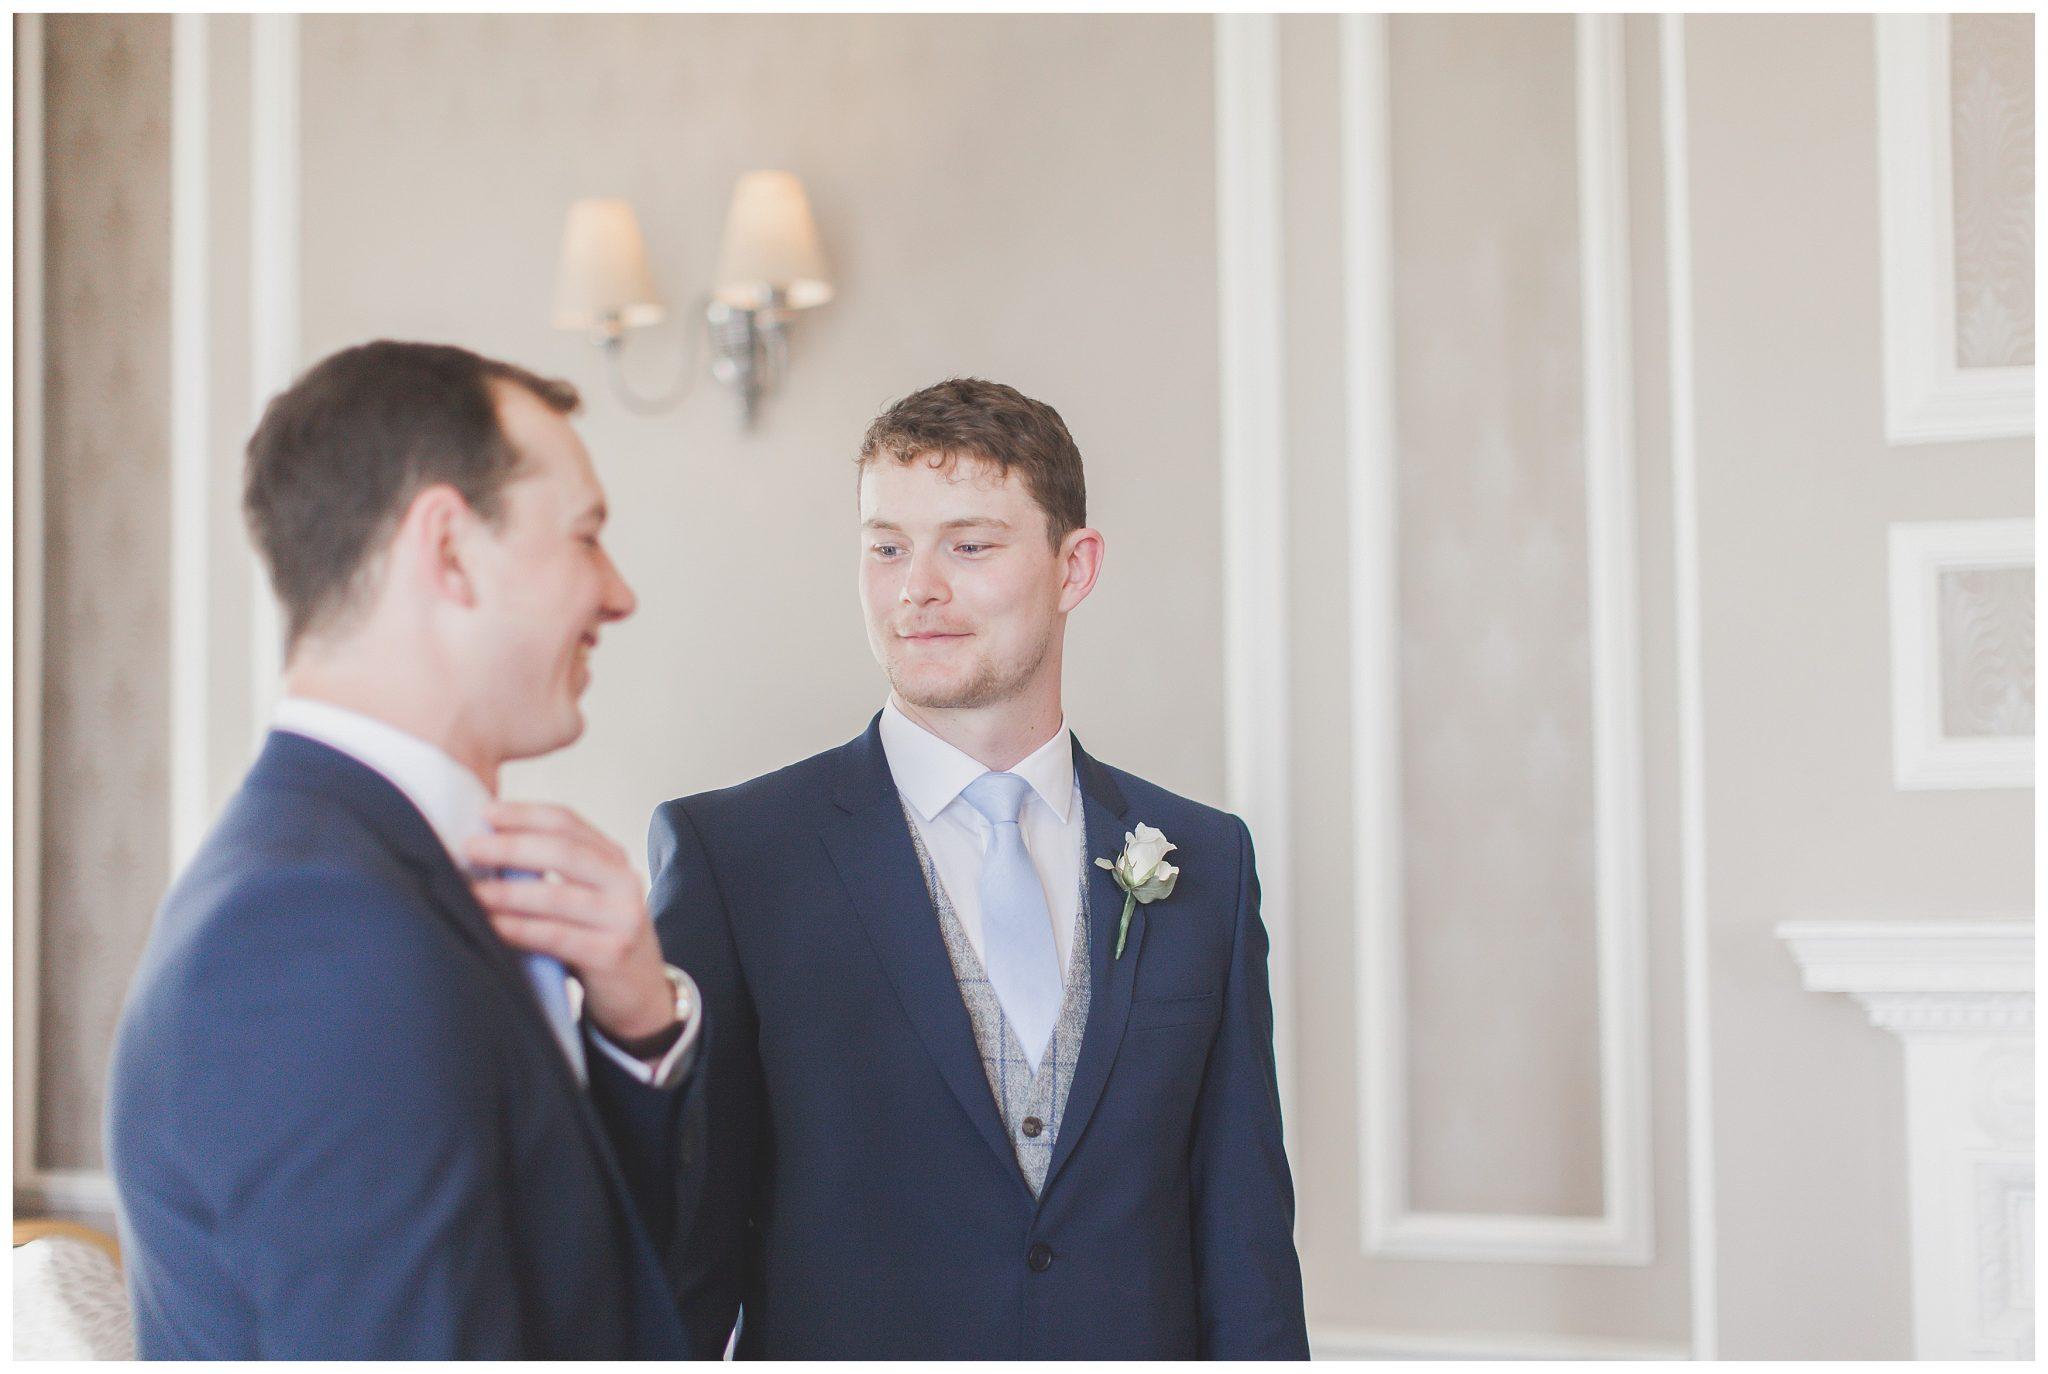 Best man looking at the groom